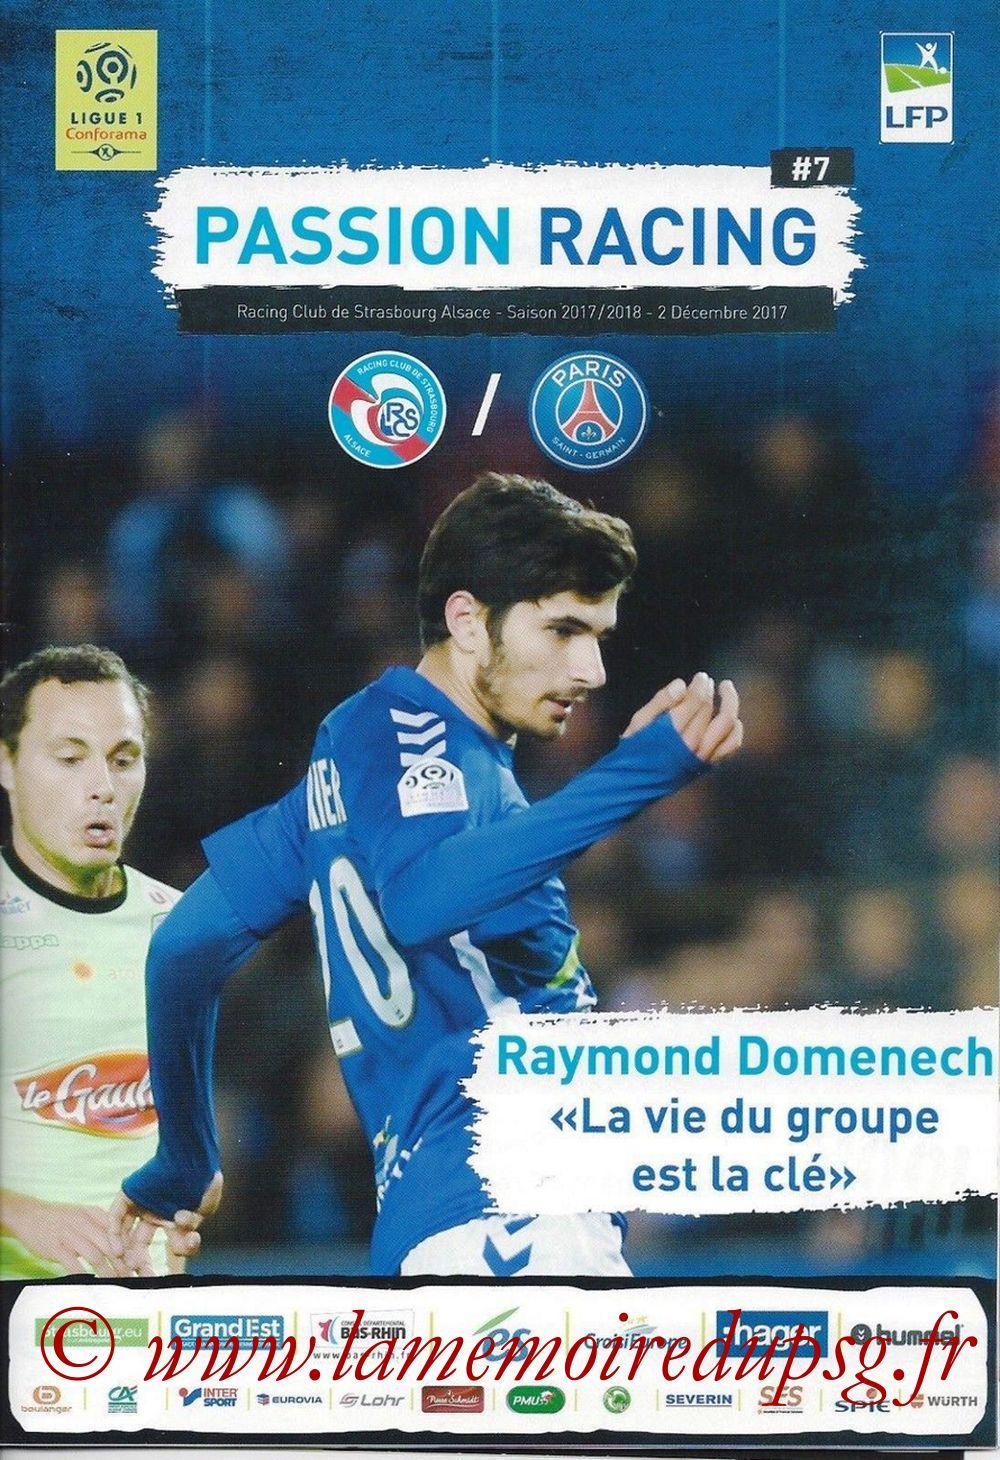 2017-12-02  Strasbourg-PSG (16ème L1, Passion Racing N°7)